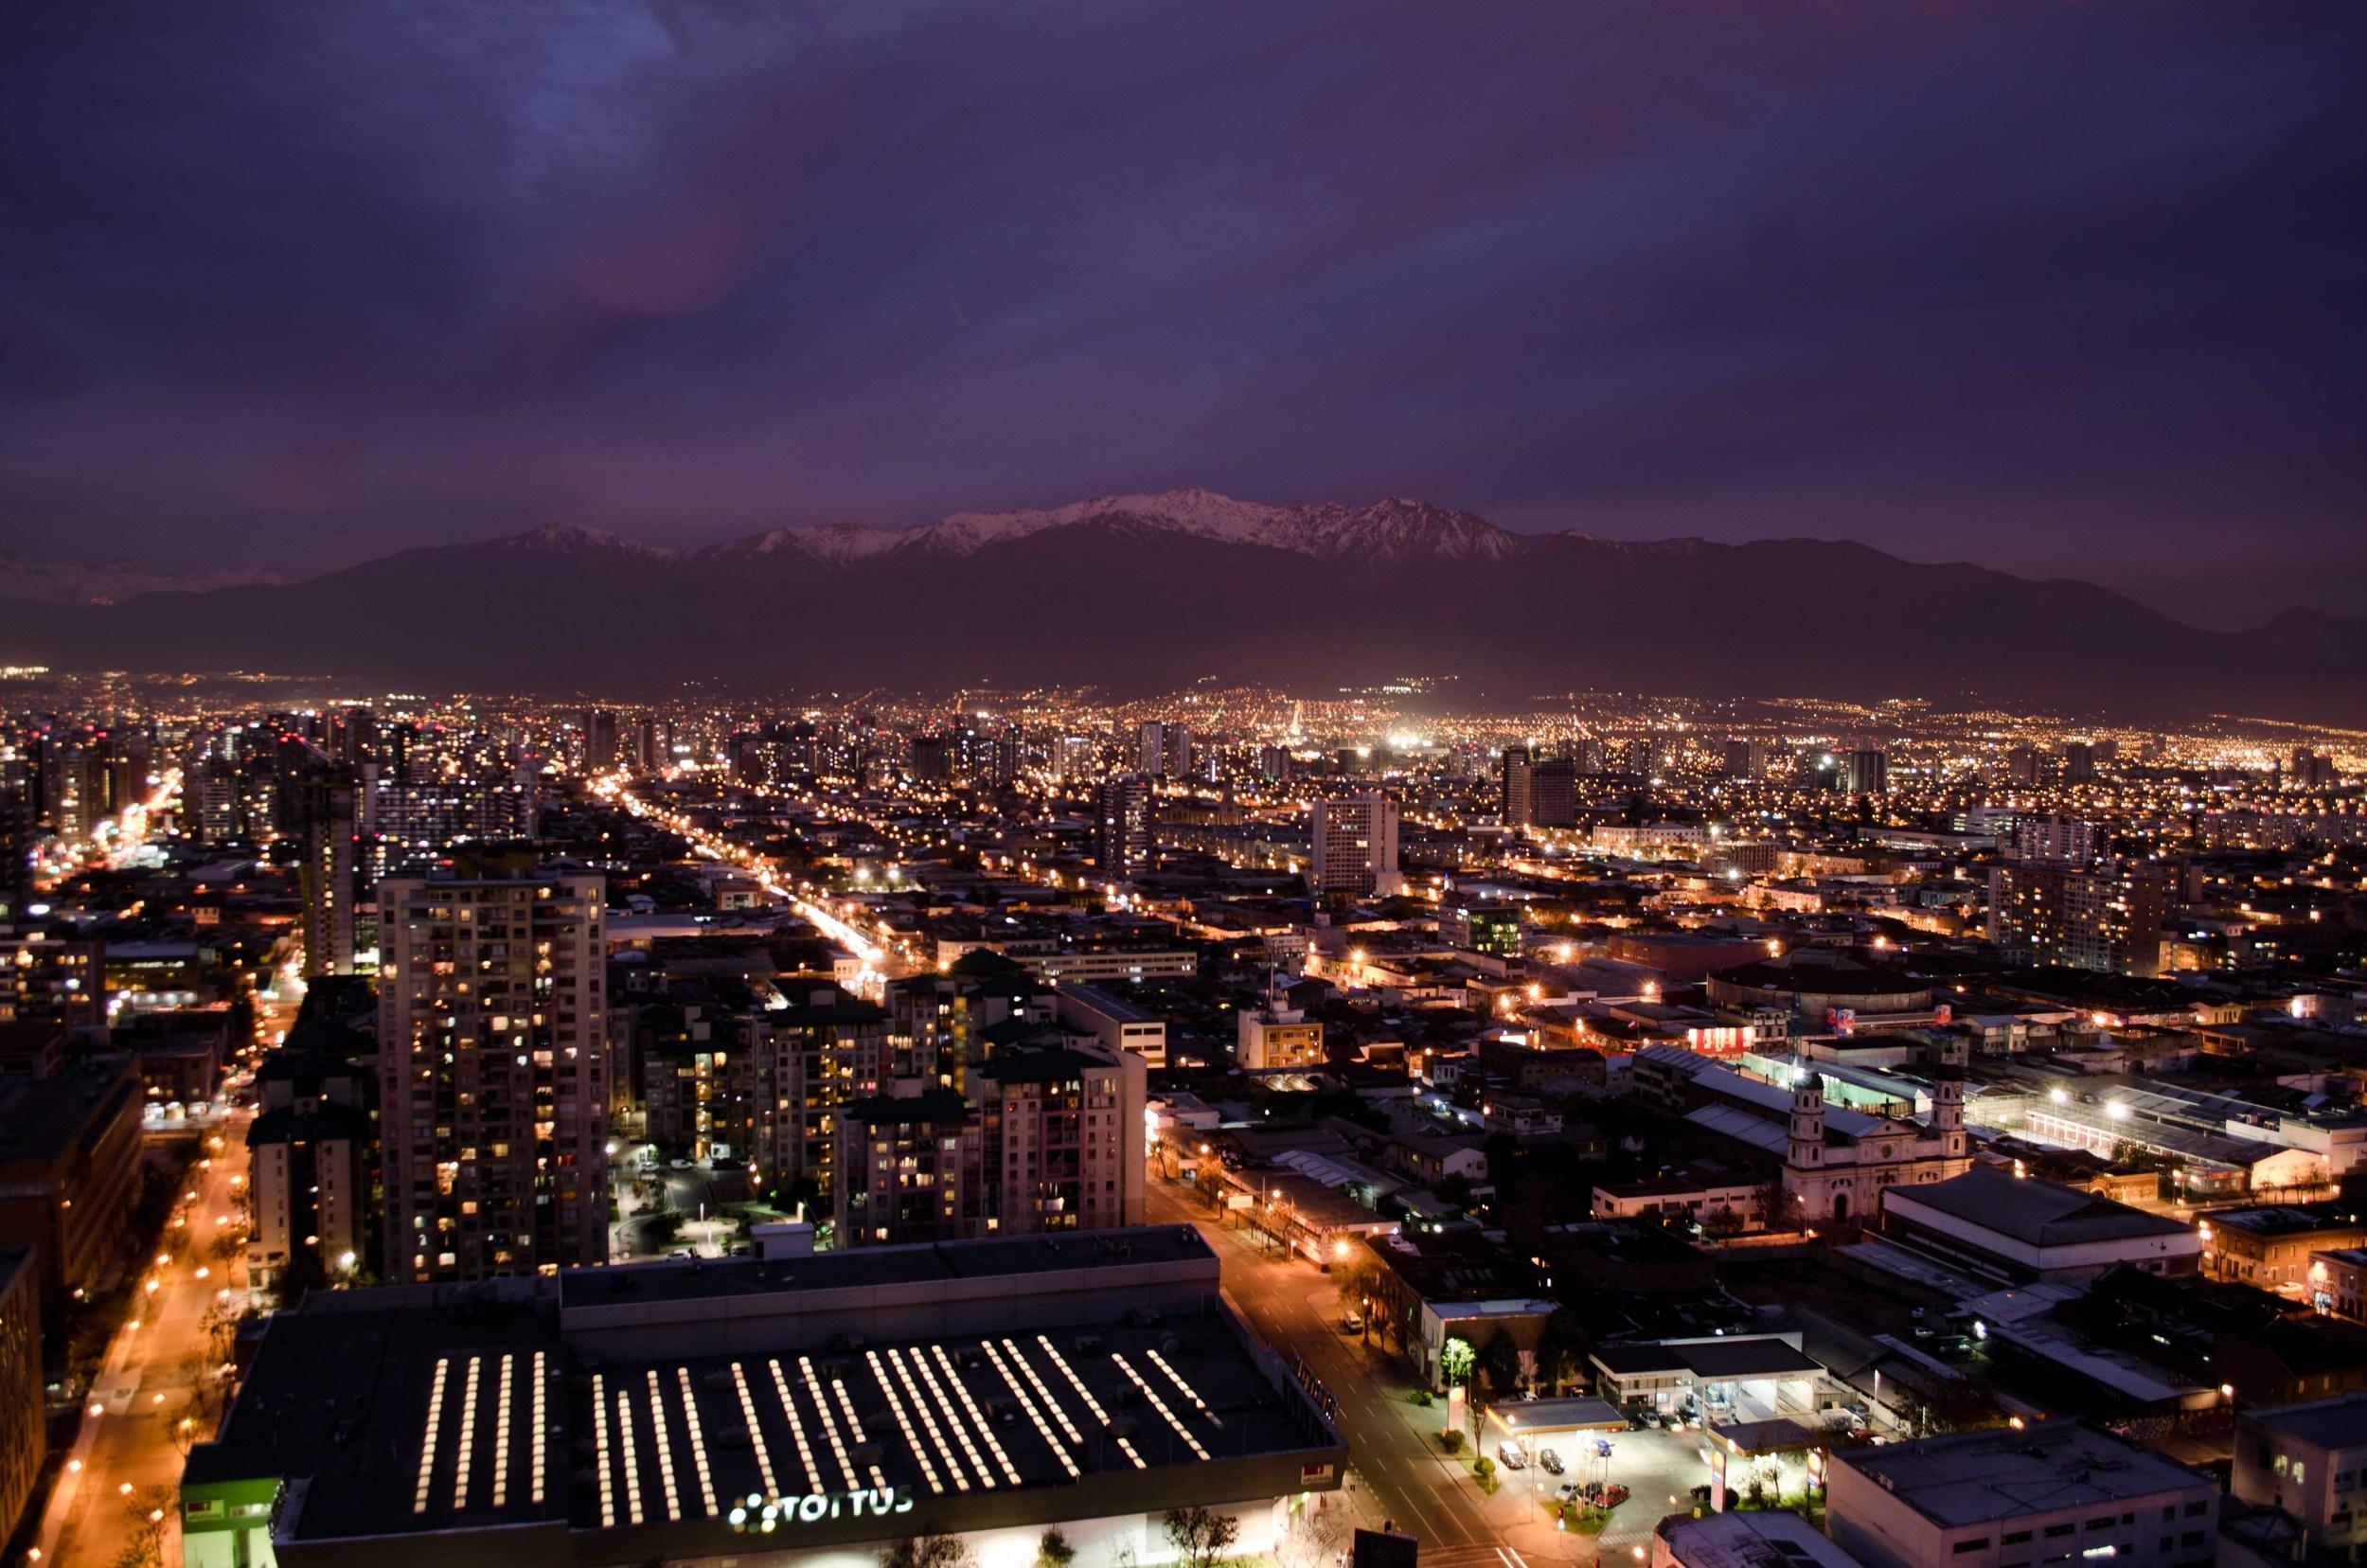 Chile-2-2.jpg